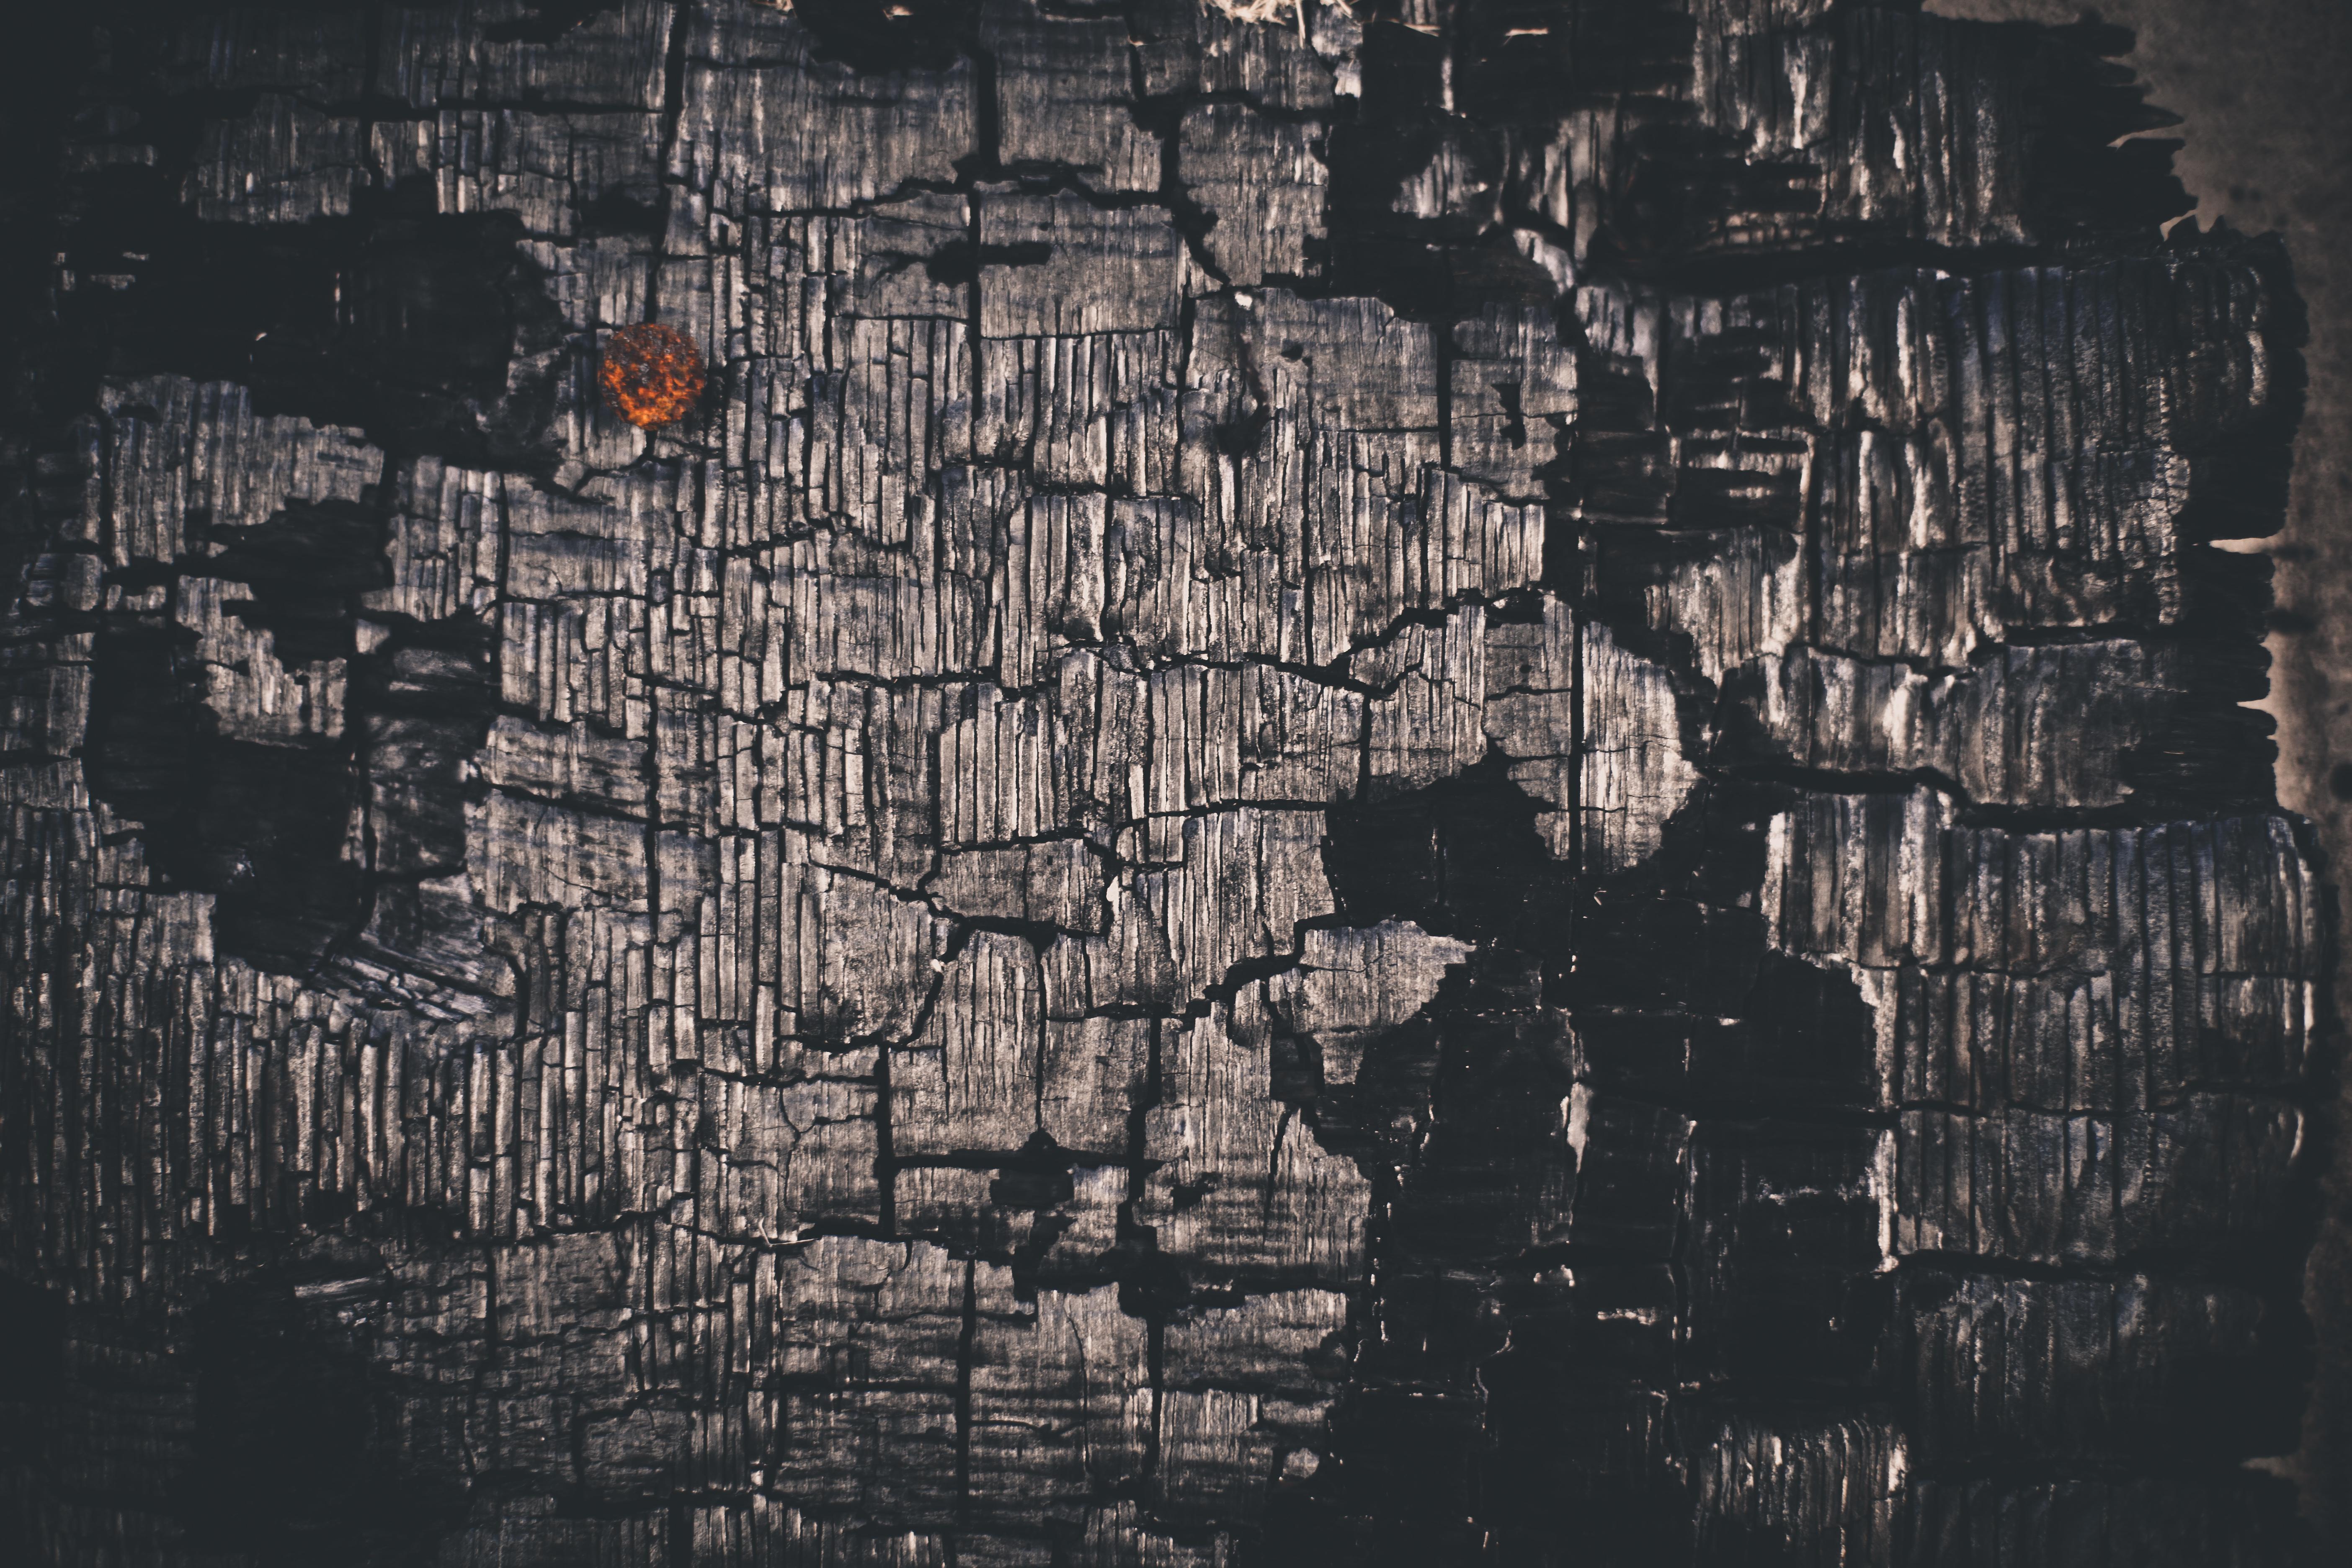 Charcoaled Wood Texture, Black, Burn, Burned, Charcoal, HQ Photo